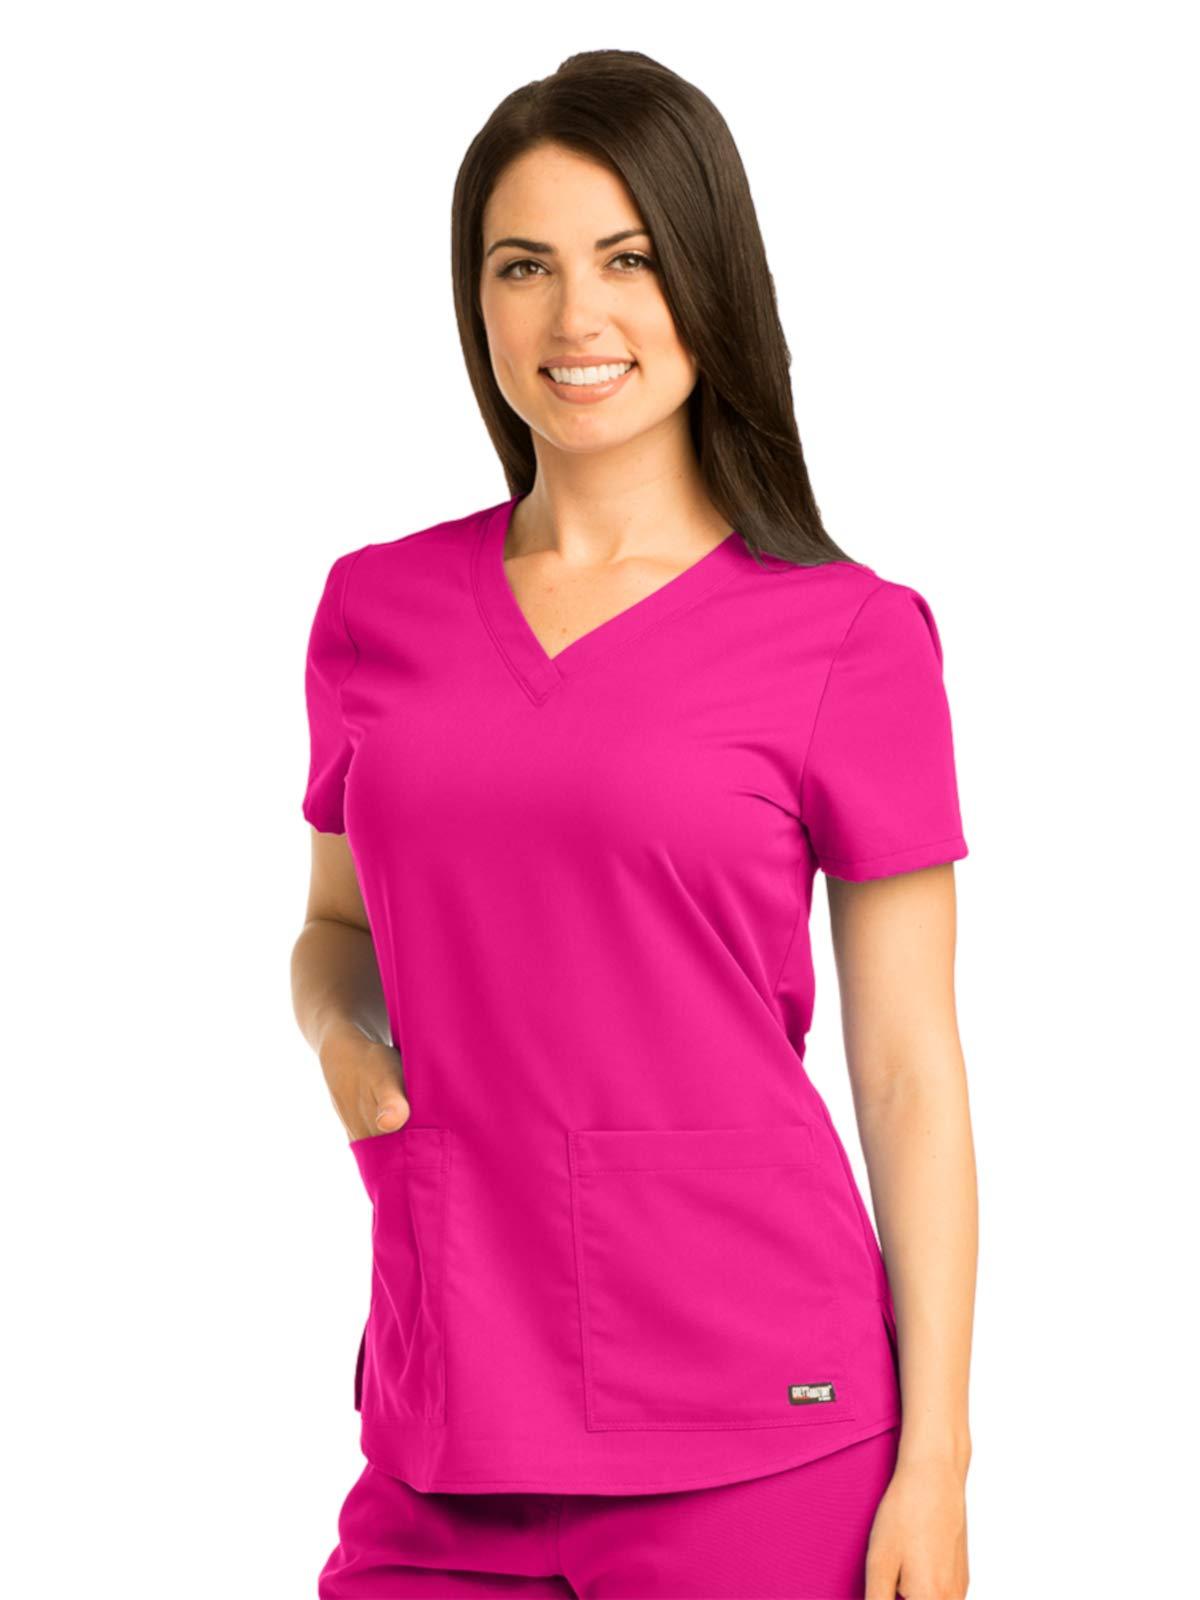 Grey's Anatomy 71166 V-Neck Top Raspberry Tart 5XL